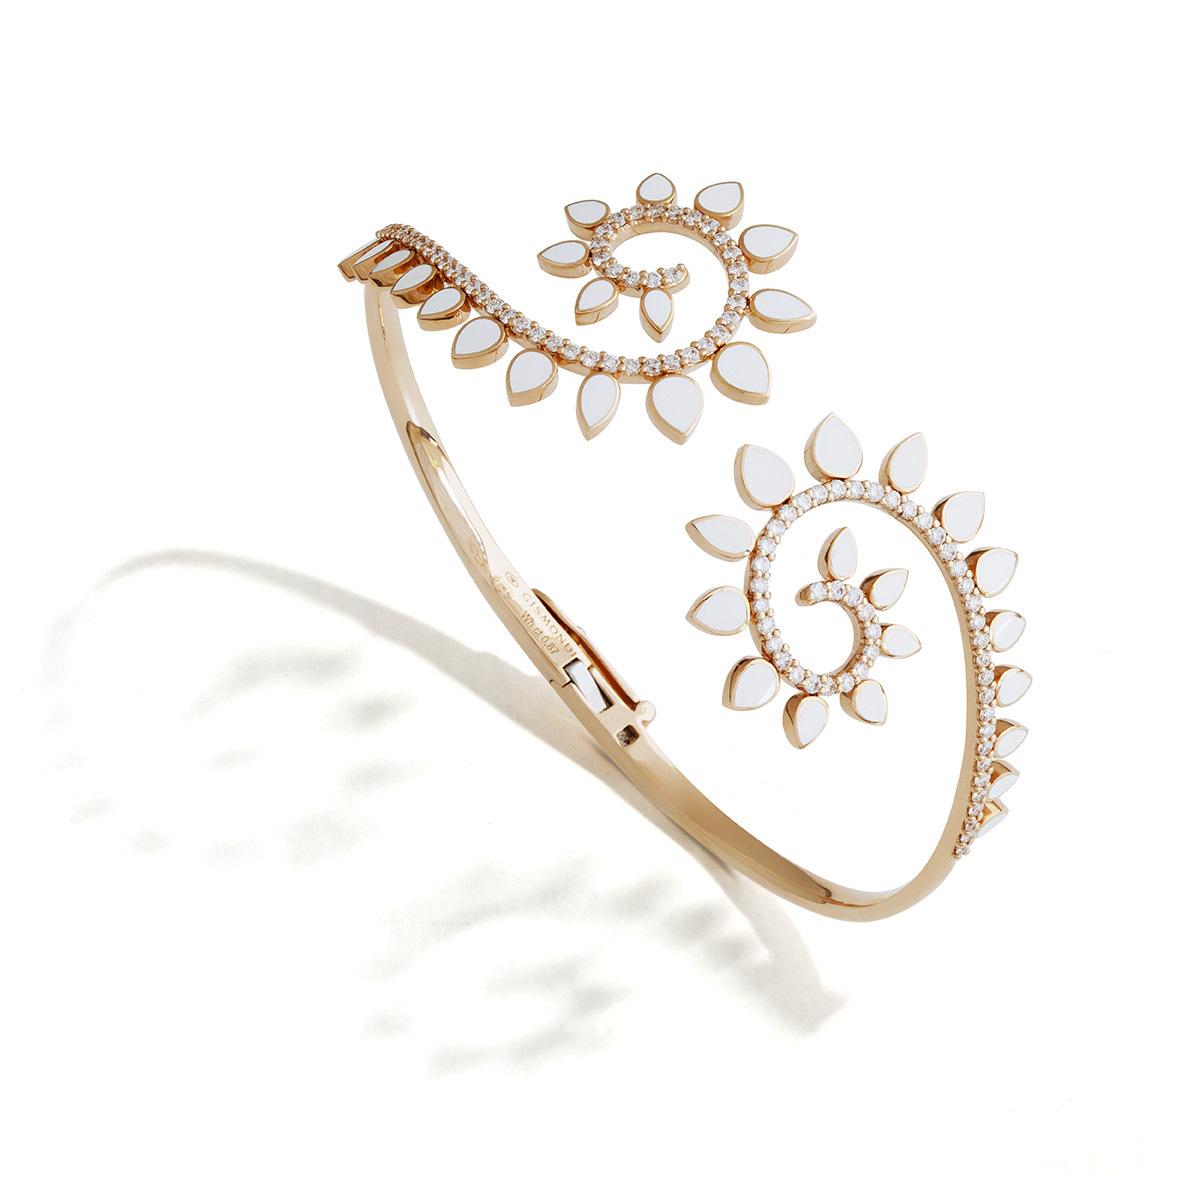 Bracciale in oro rosa, ceramica bianca e diamanti.